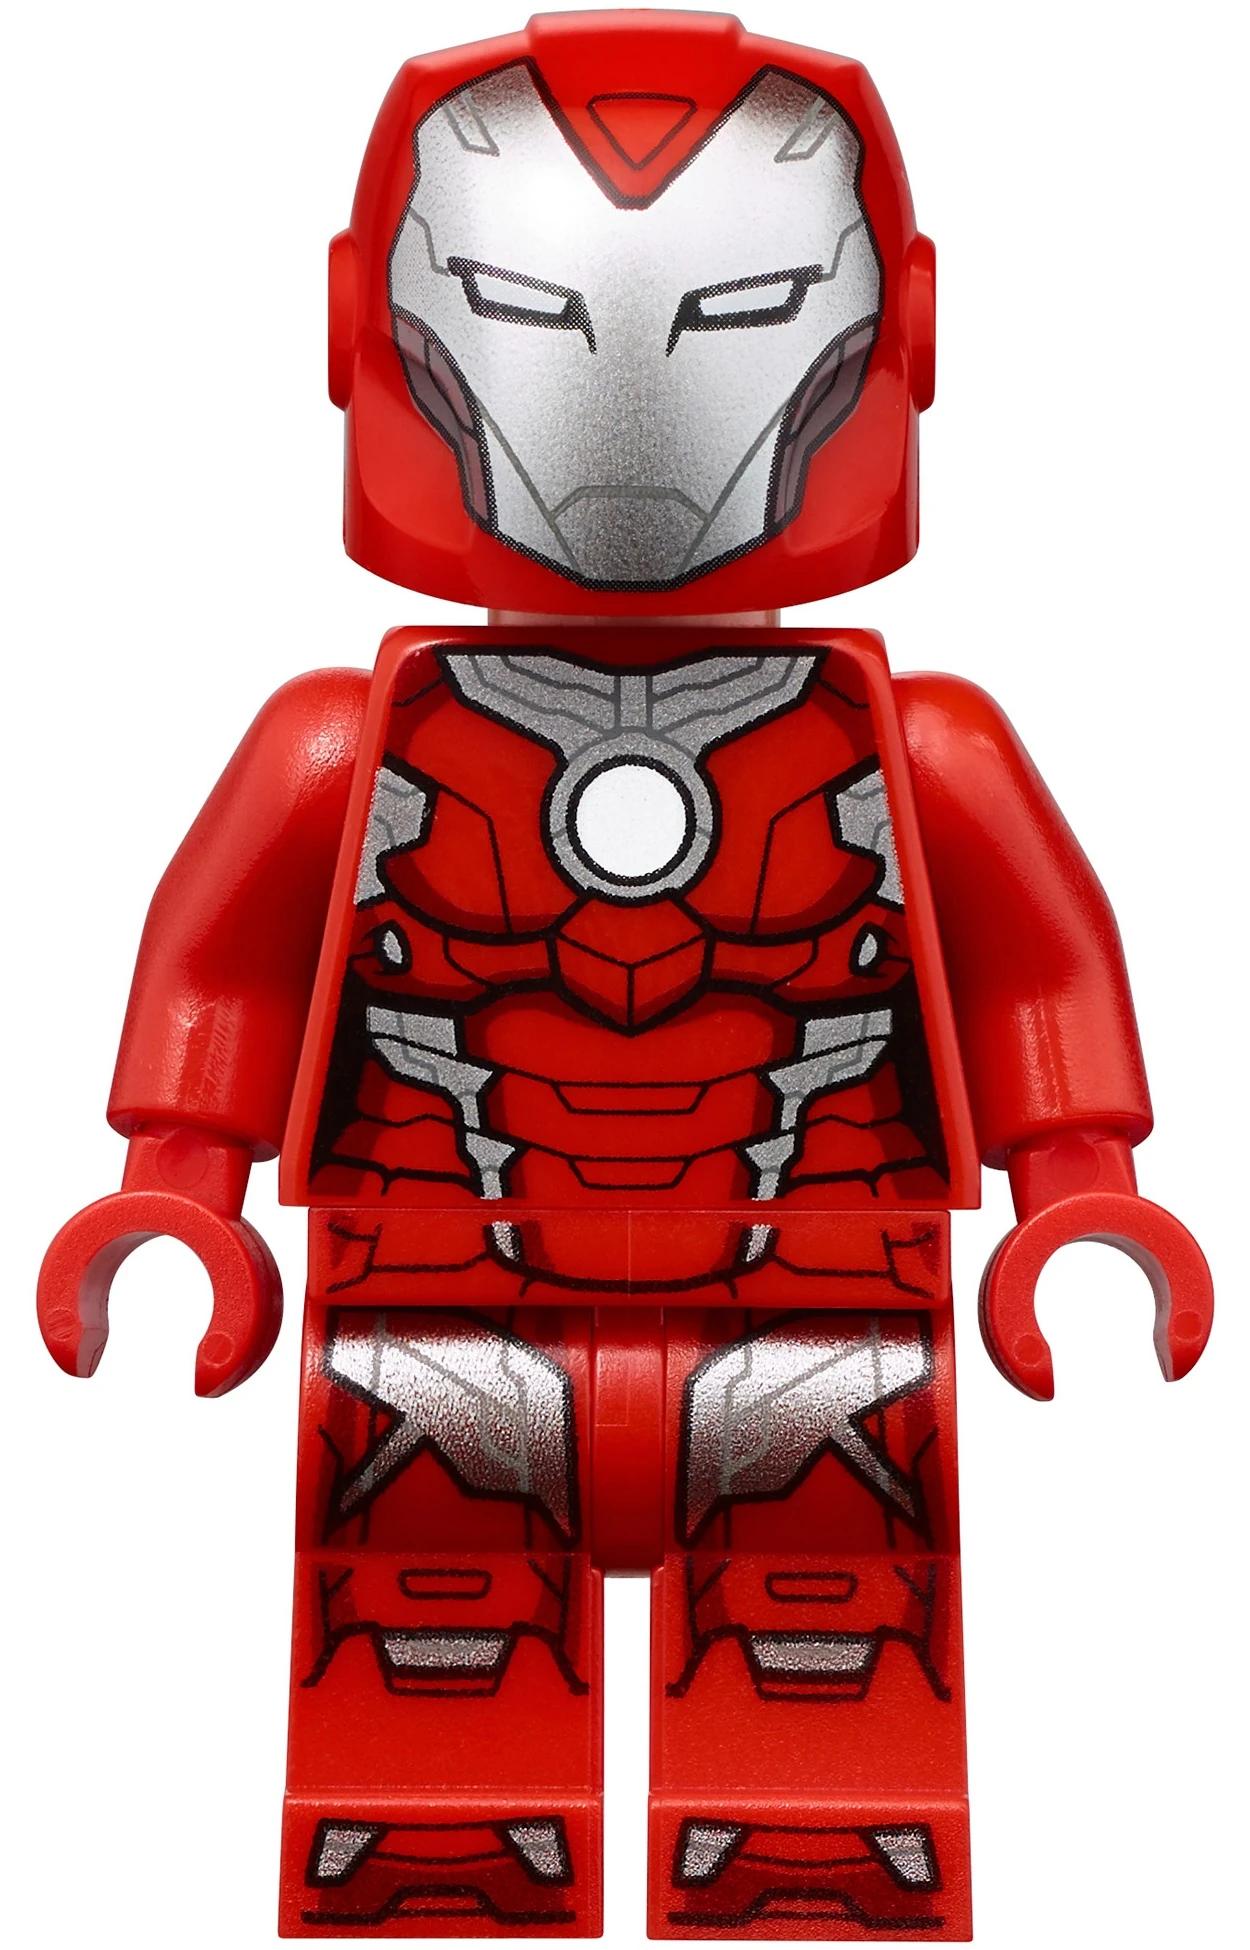 LEGO Marvel Superheroes 76144 Rescue Pepper Potts Minifigure *BRAND NEW nd3